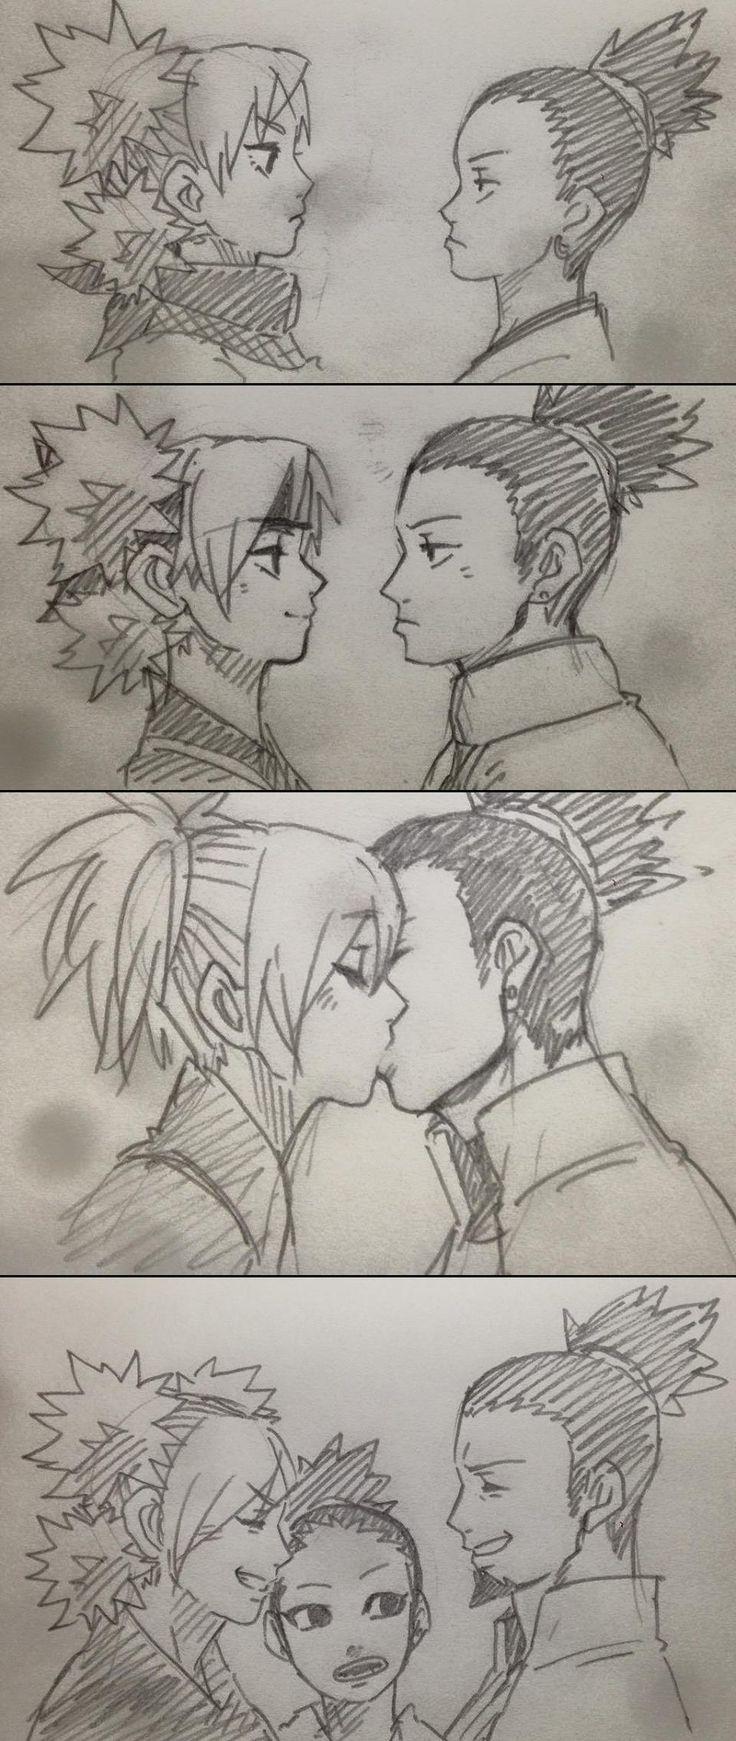 Shikamaru and Temari